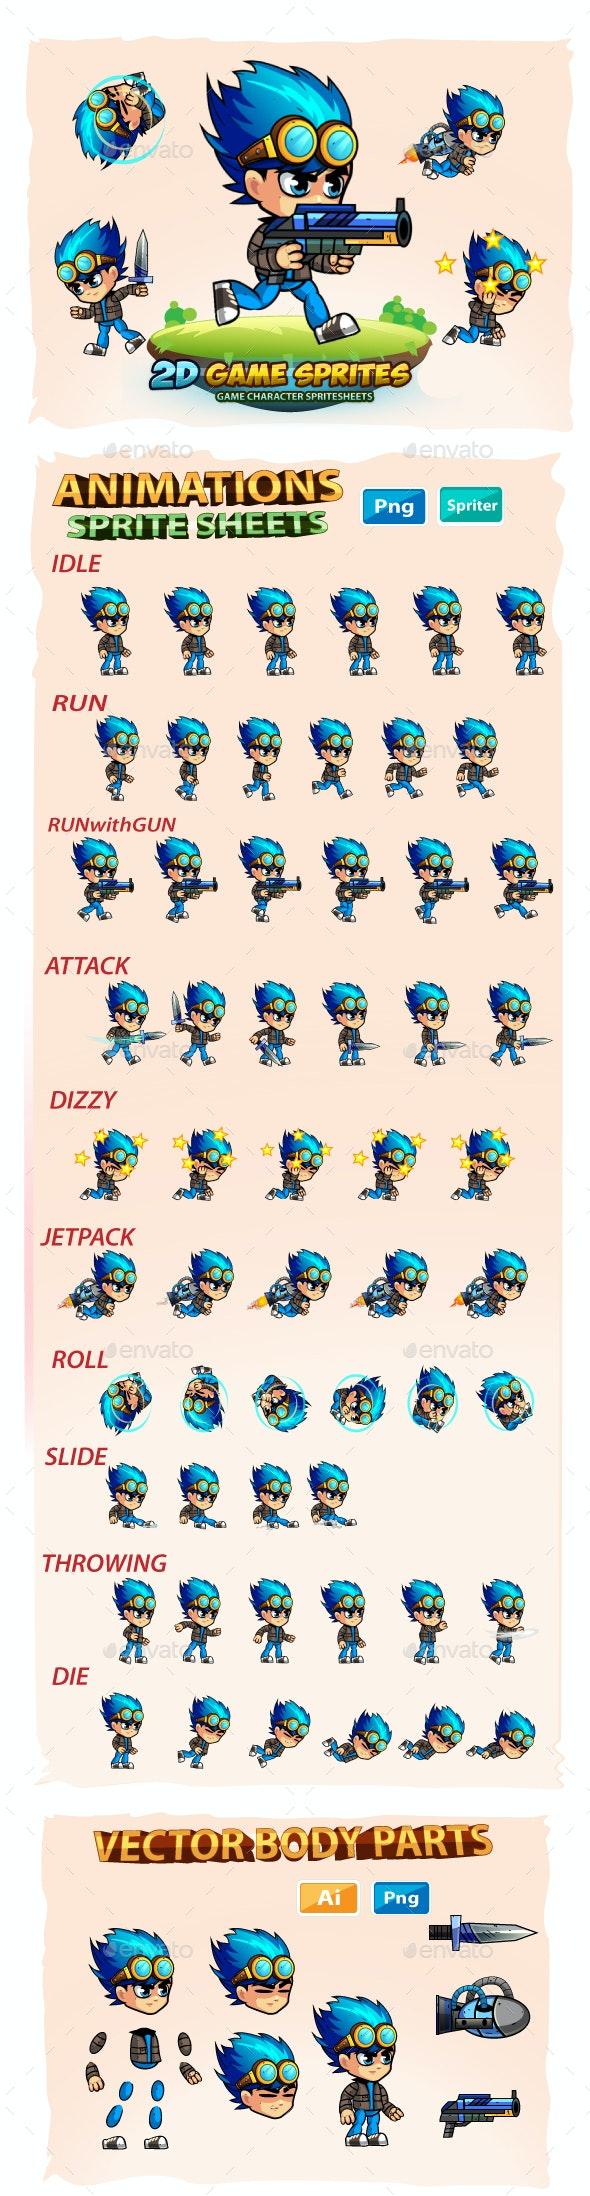 2D- Game Character Sprites - Sprites Game Assets